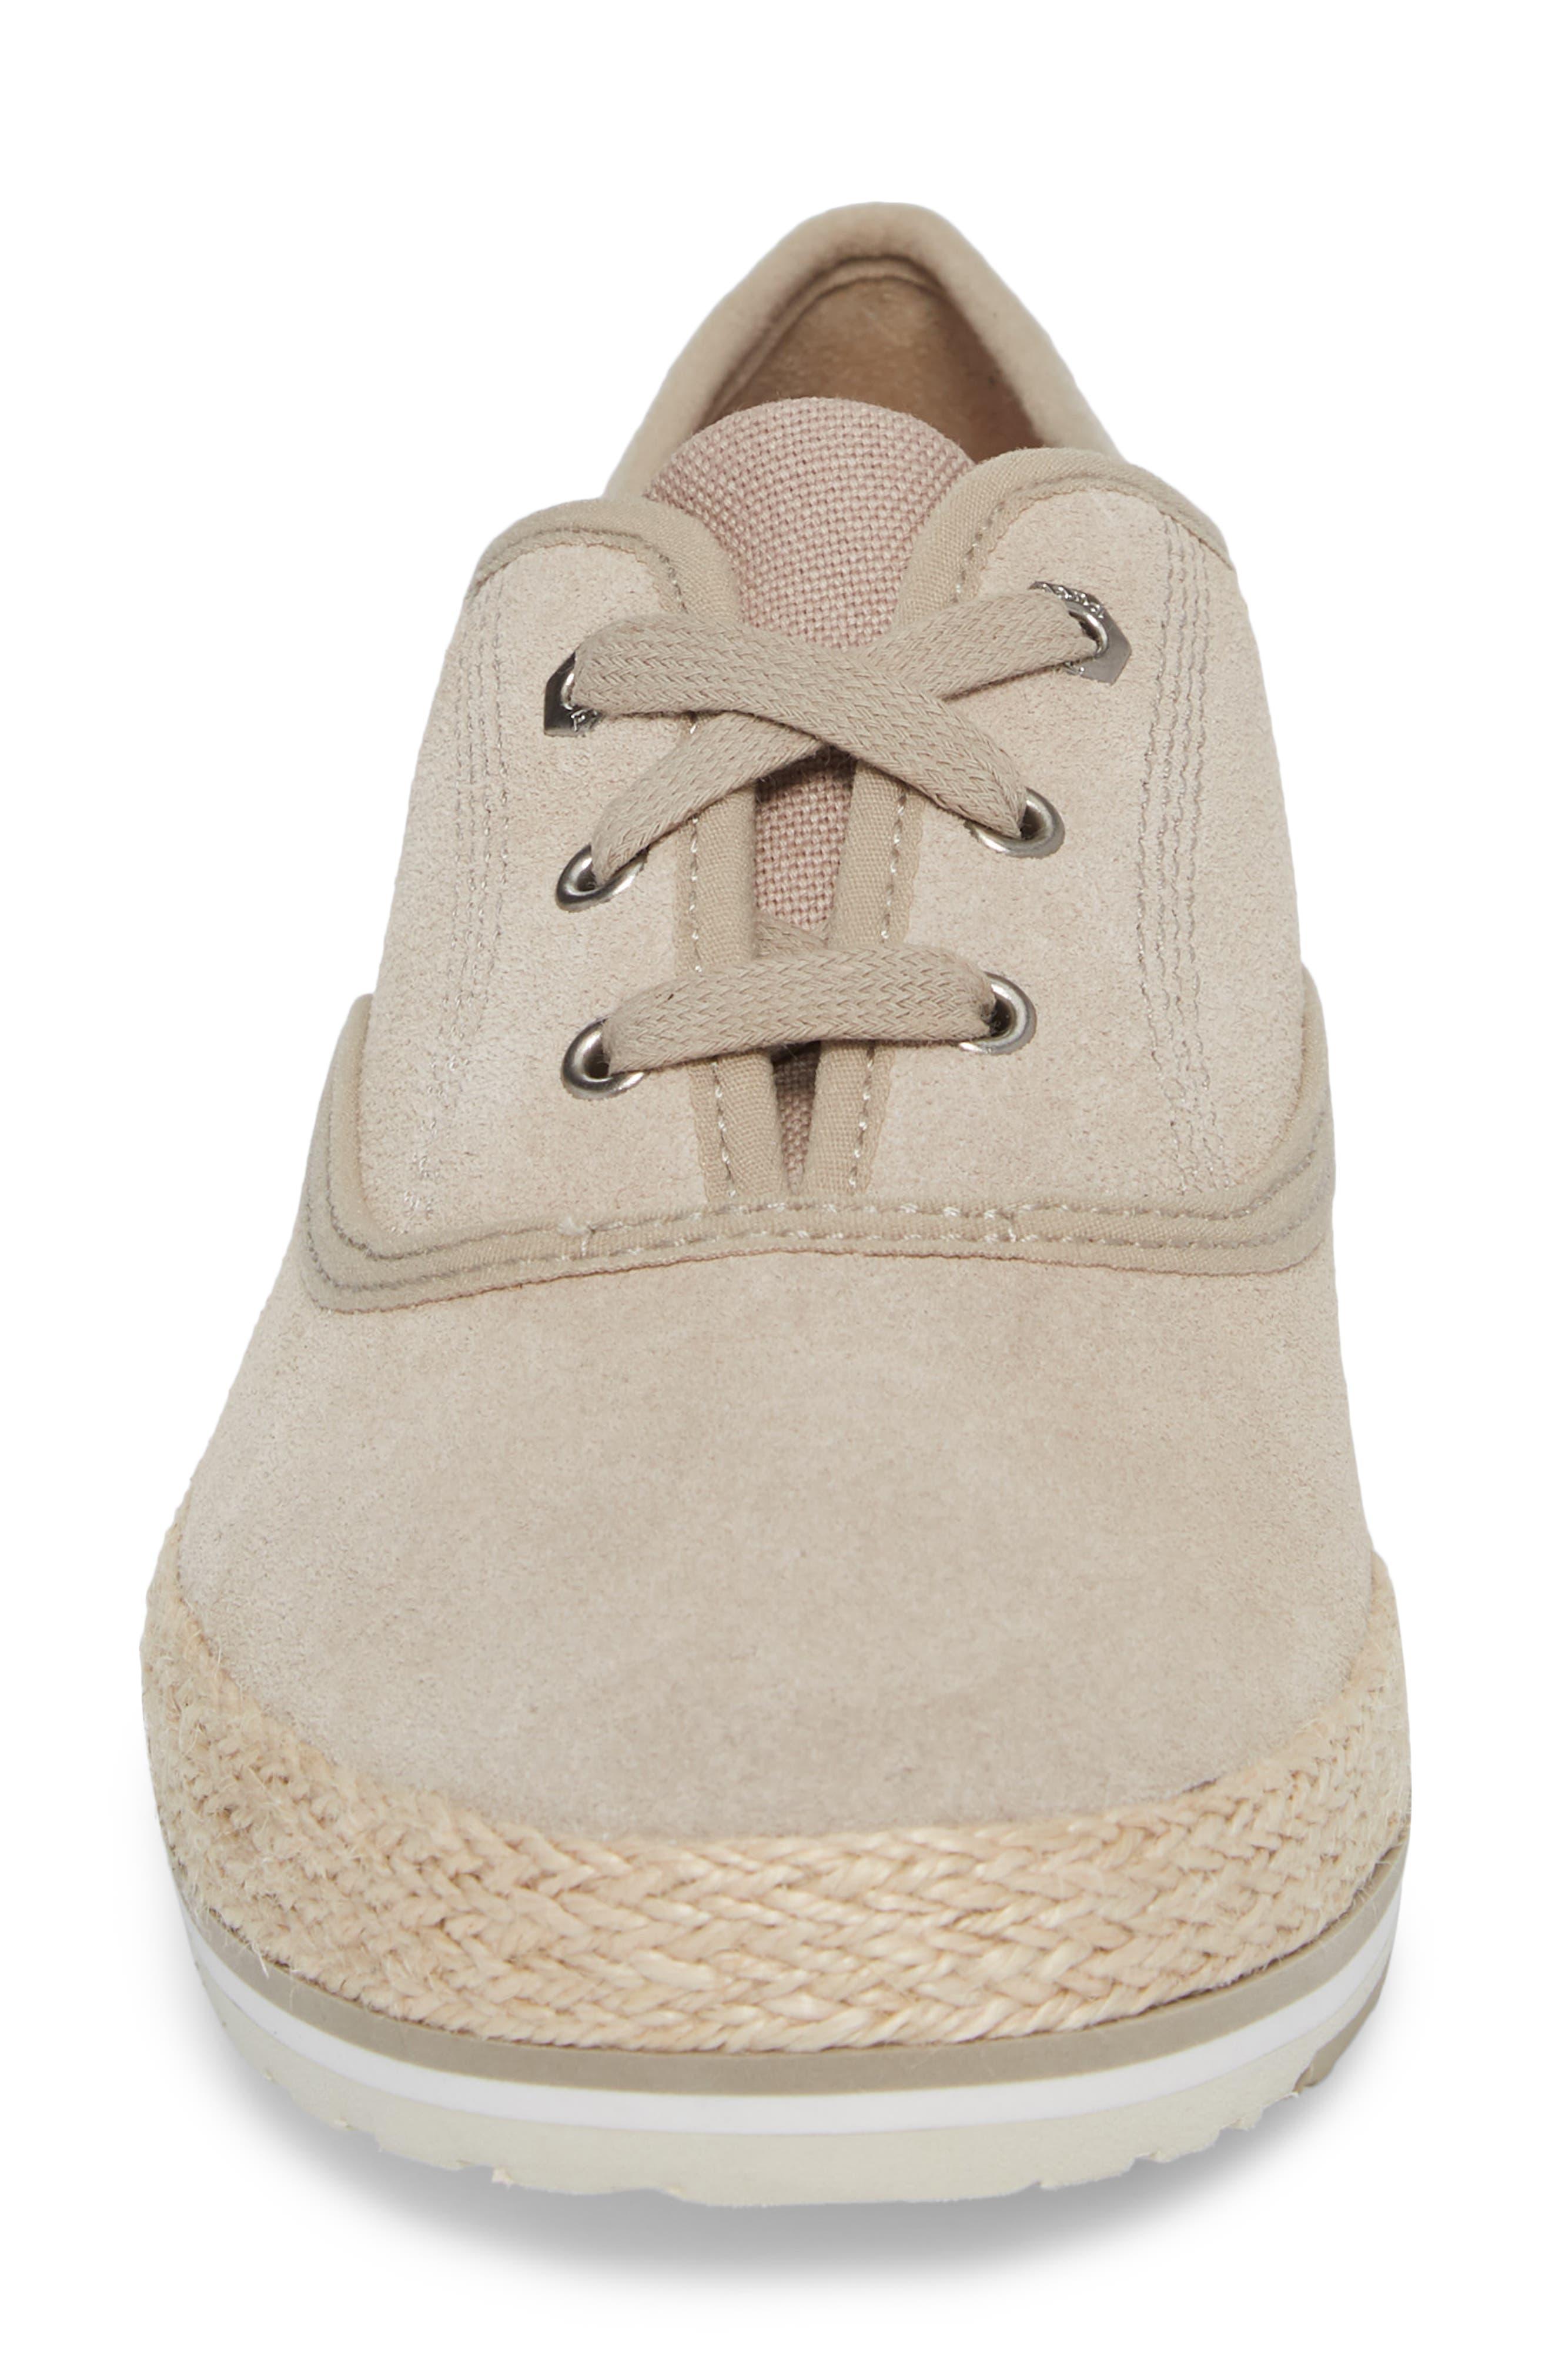 Eivissa Sea Oxford Sneaker,                             Alternate thumbnail 4, color,                             270